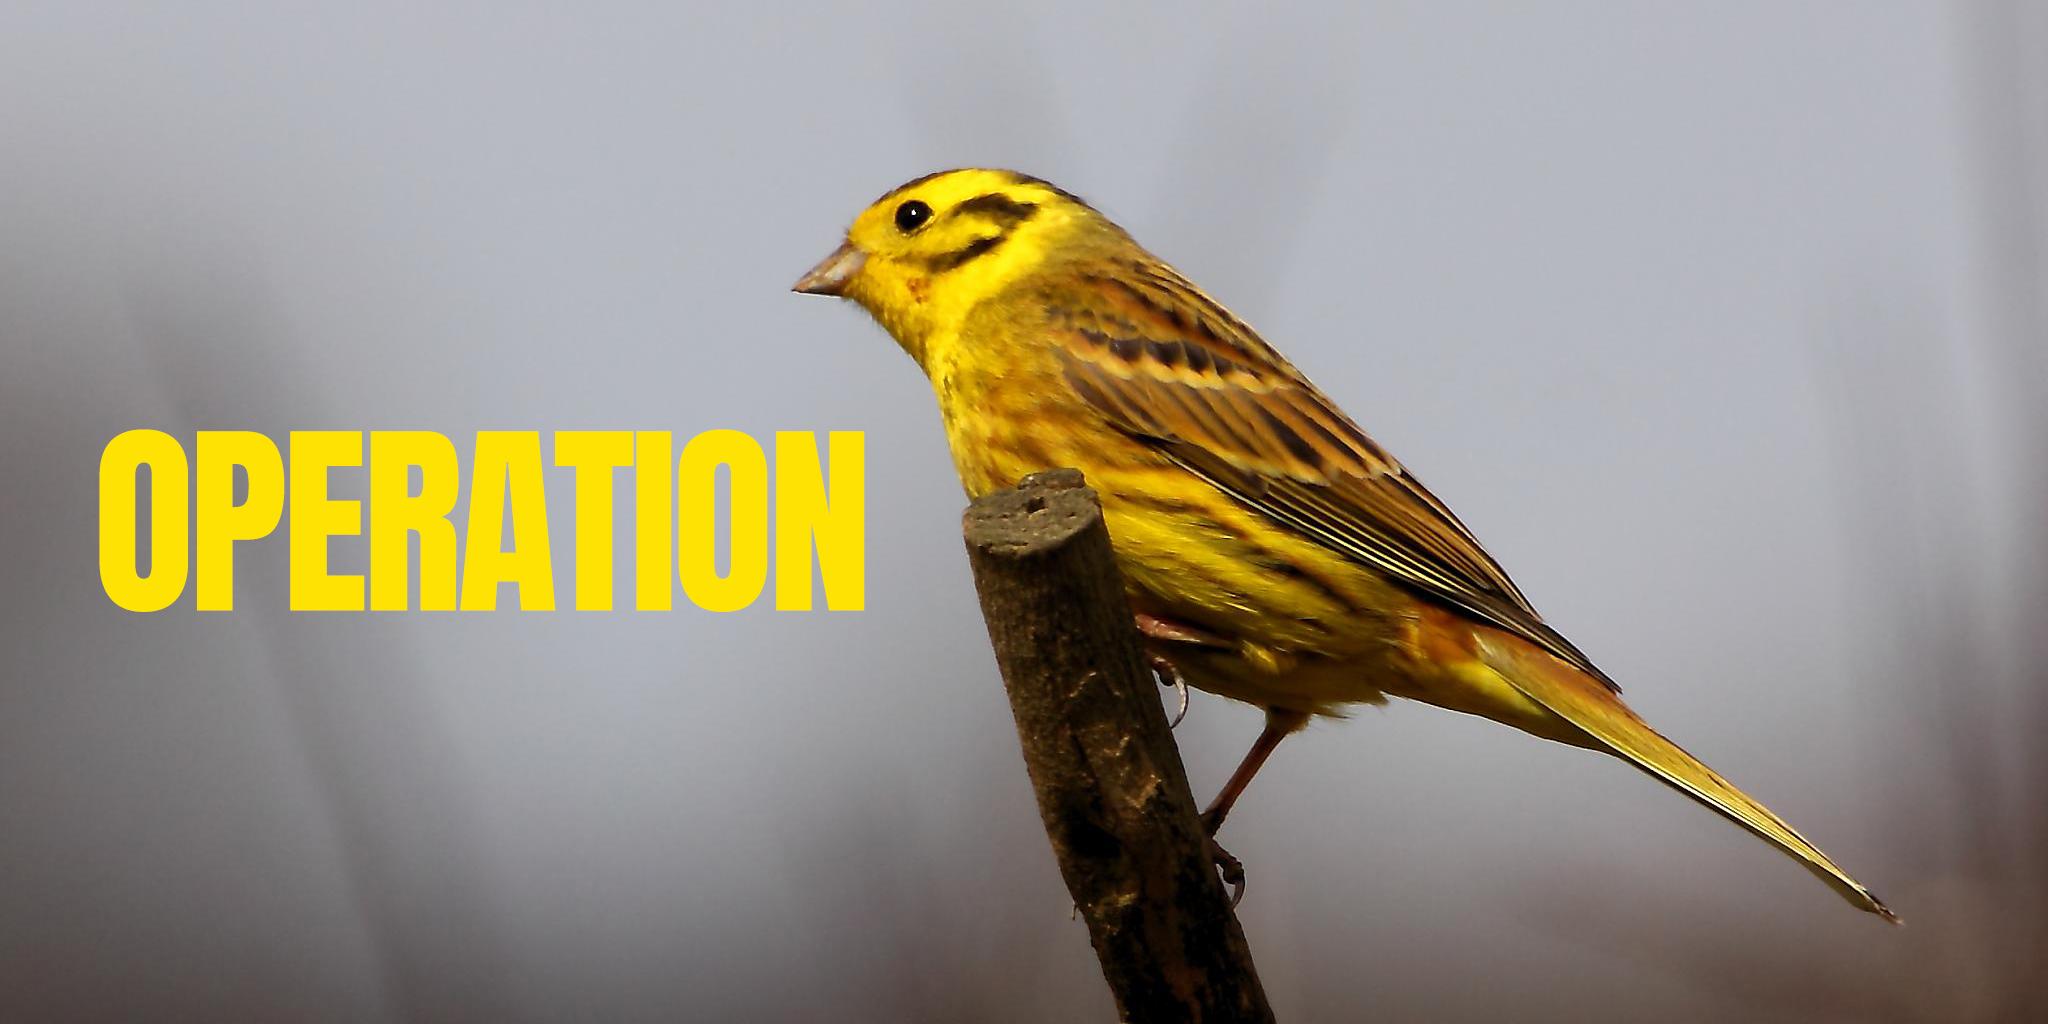 Bird or Document?